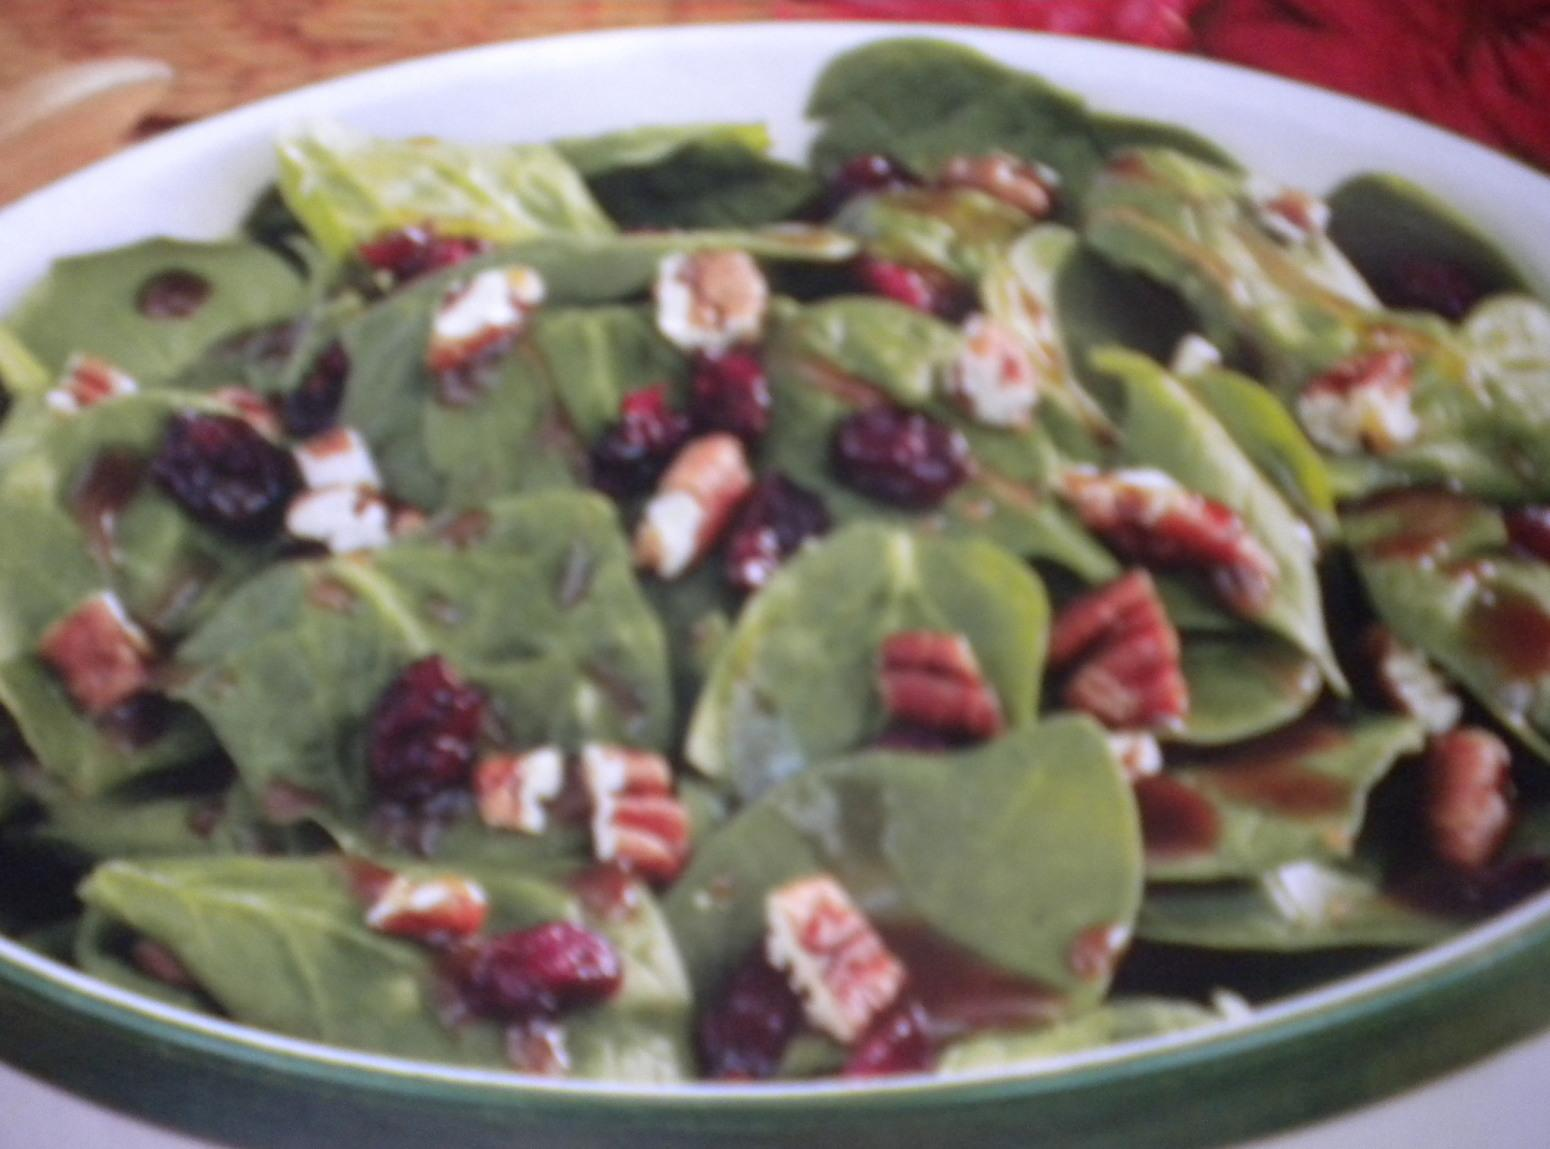 150+ Easy Summer Salad Recipes - Healthy Salad Ideas for ...